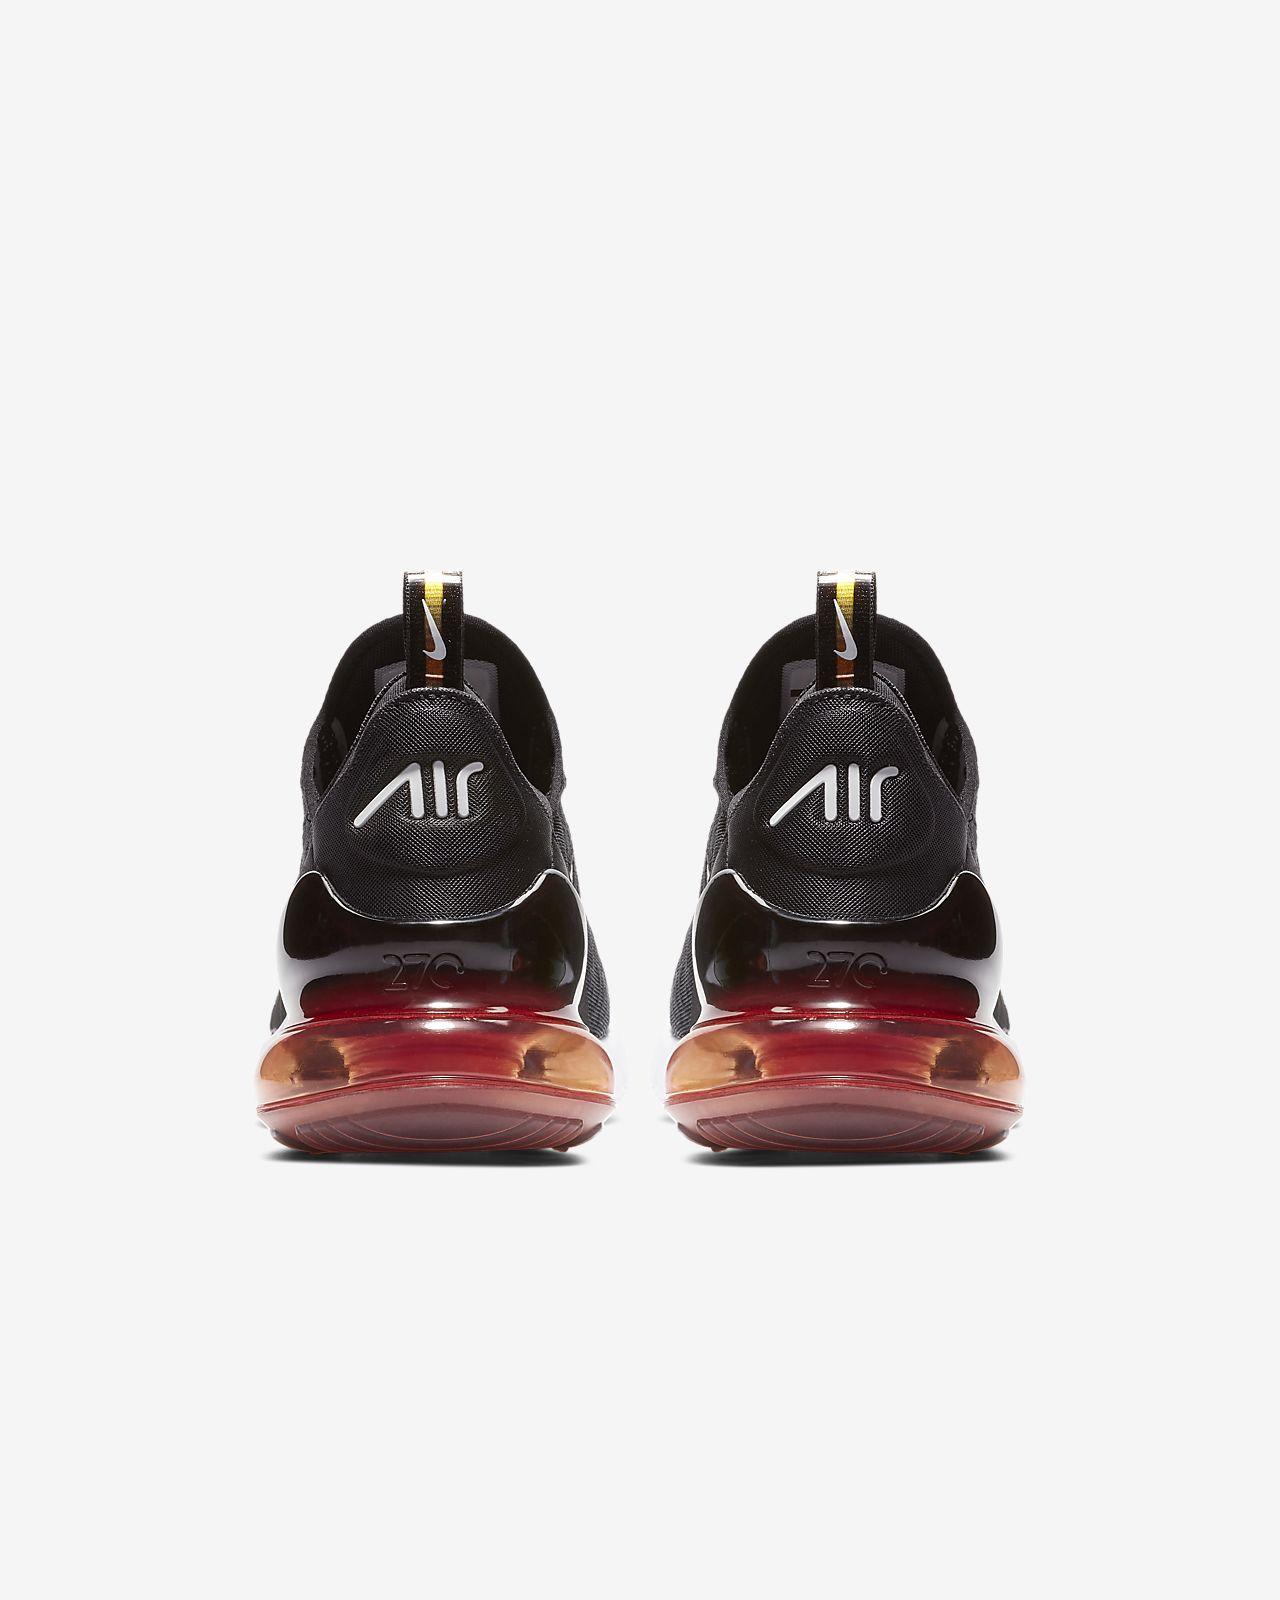 huge discount 59916 0bdc9 ... Sko Nike Air Max 270 SE för män